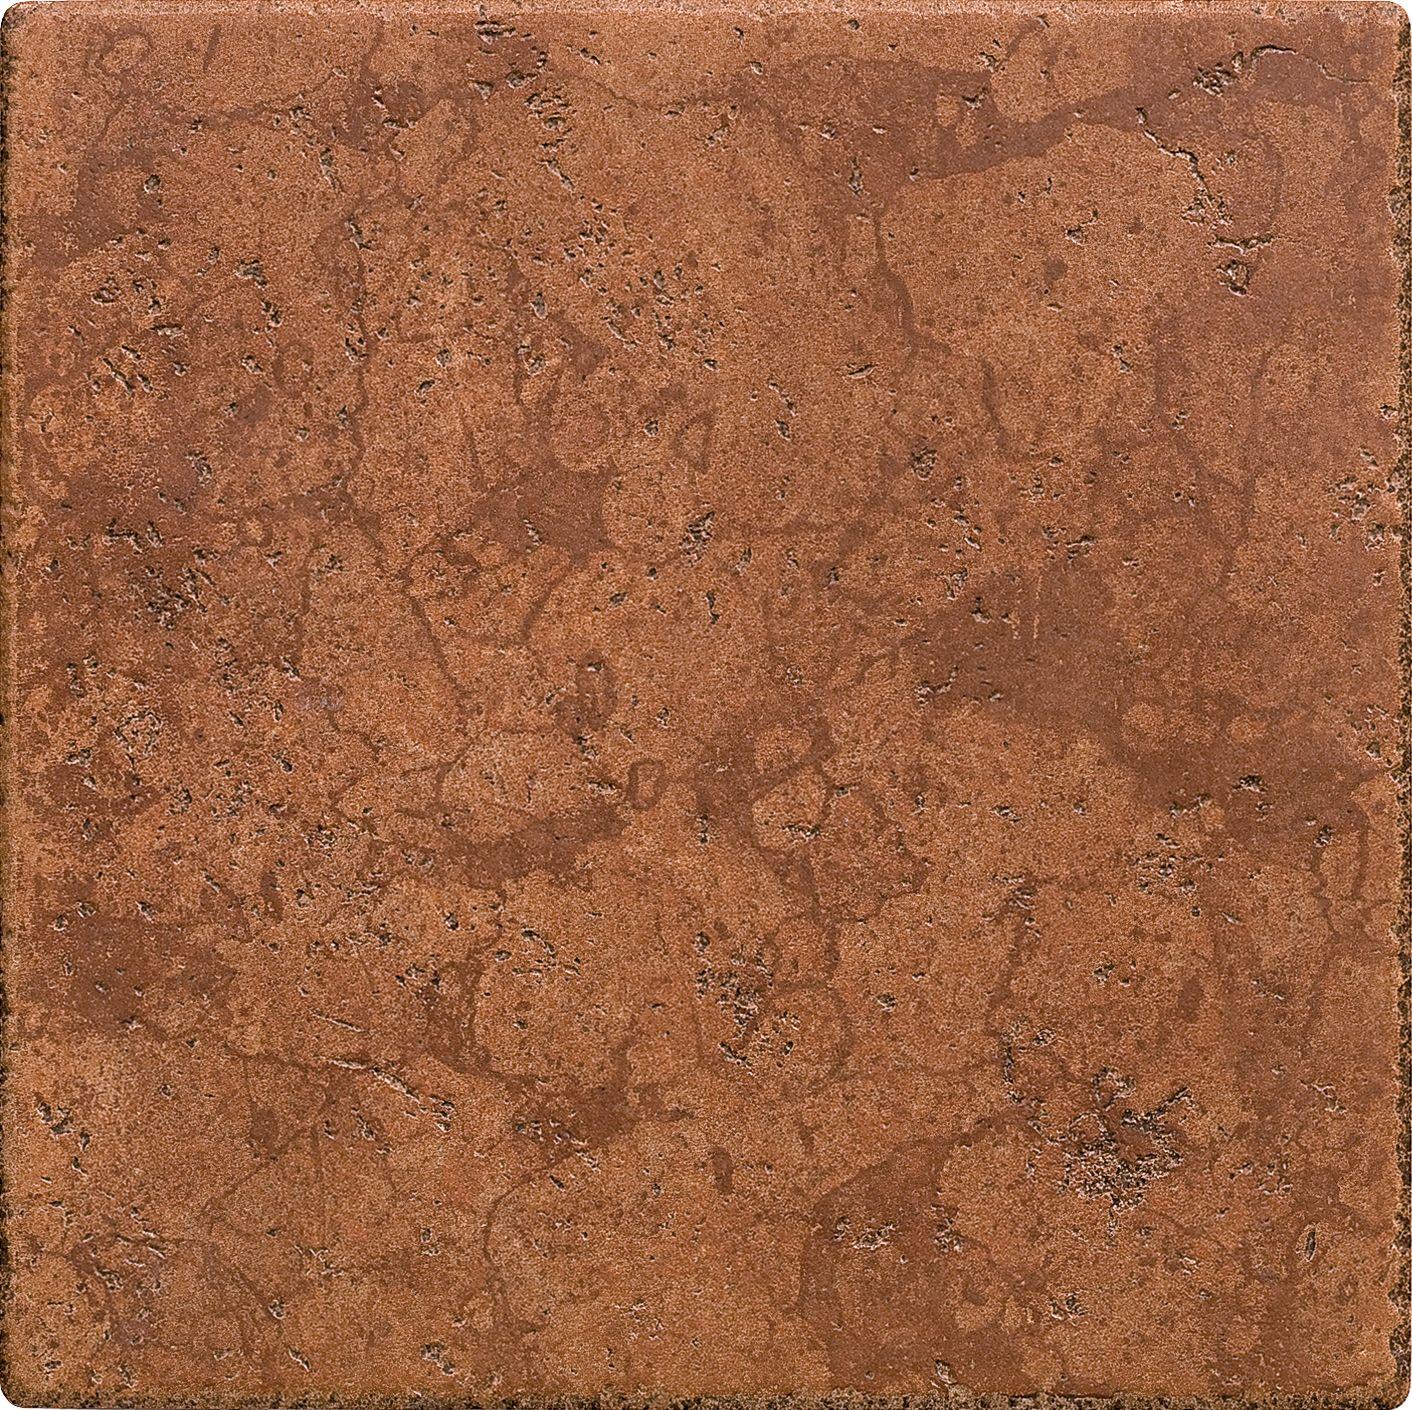 Del Conca Rialto Terra Thru Body Porcelain Floor Tile Common 12 In X 12 In Actual 11 81 In X 11 81 In Lowes Com Porcelain Floor Tiles Porcelain Flooring Flooring